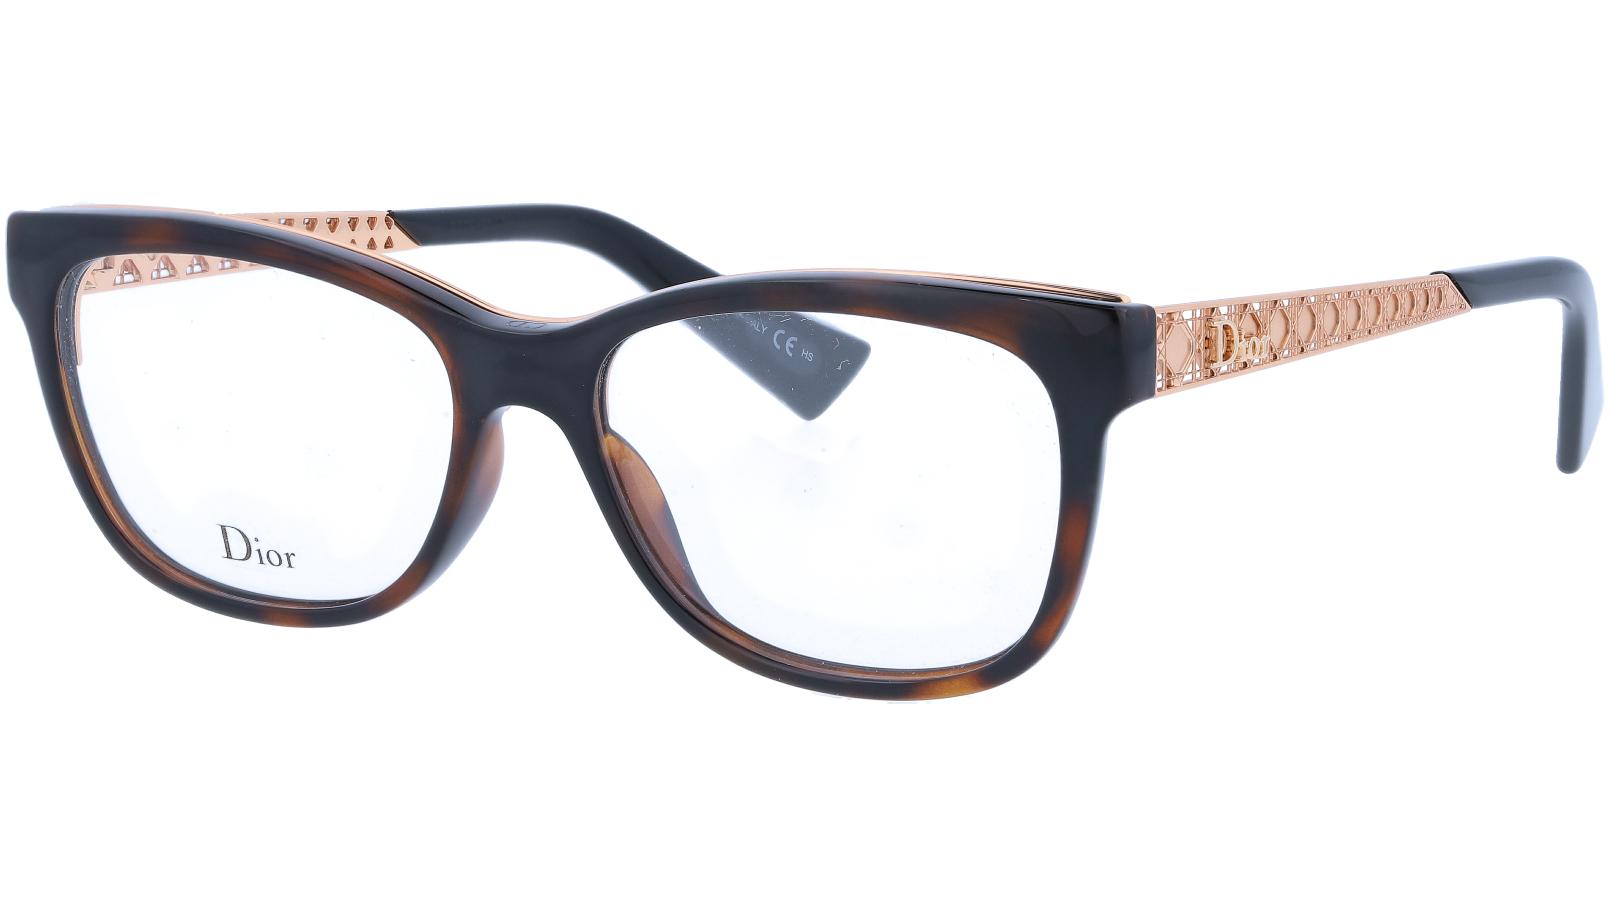 Dior AMAO1 EOG 53 Havana Glasses